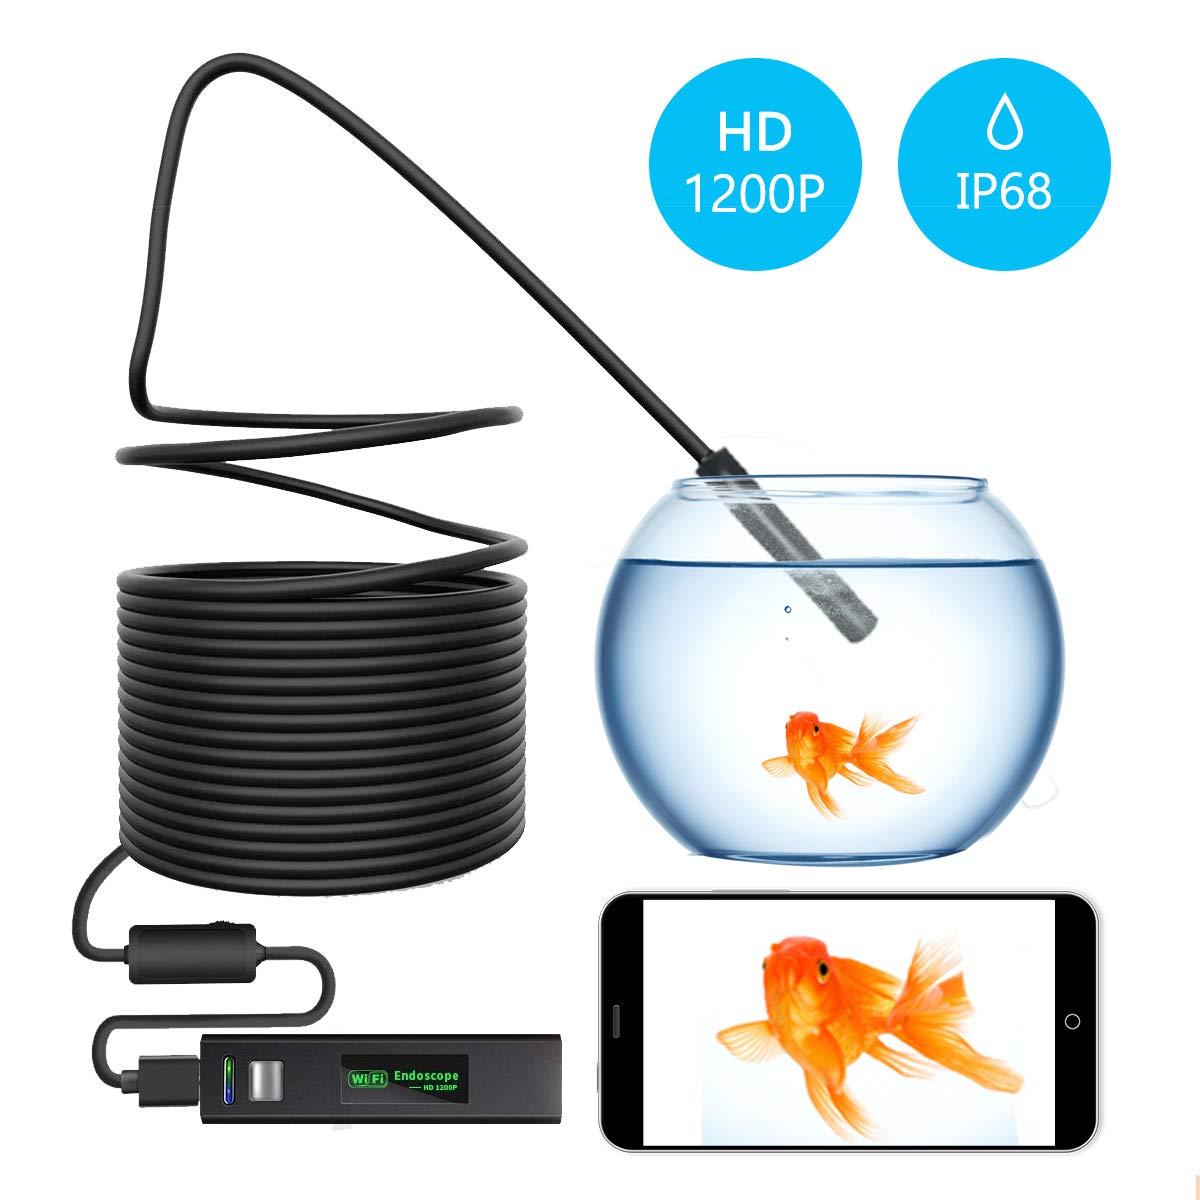 EFUTONPRO WiFi Cam/éra dinspection Semi-Rigide WiFi 1200P HD Serpent Camera endoscopique 8/lumi/ères LED iOS Smartphone Android Tablette